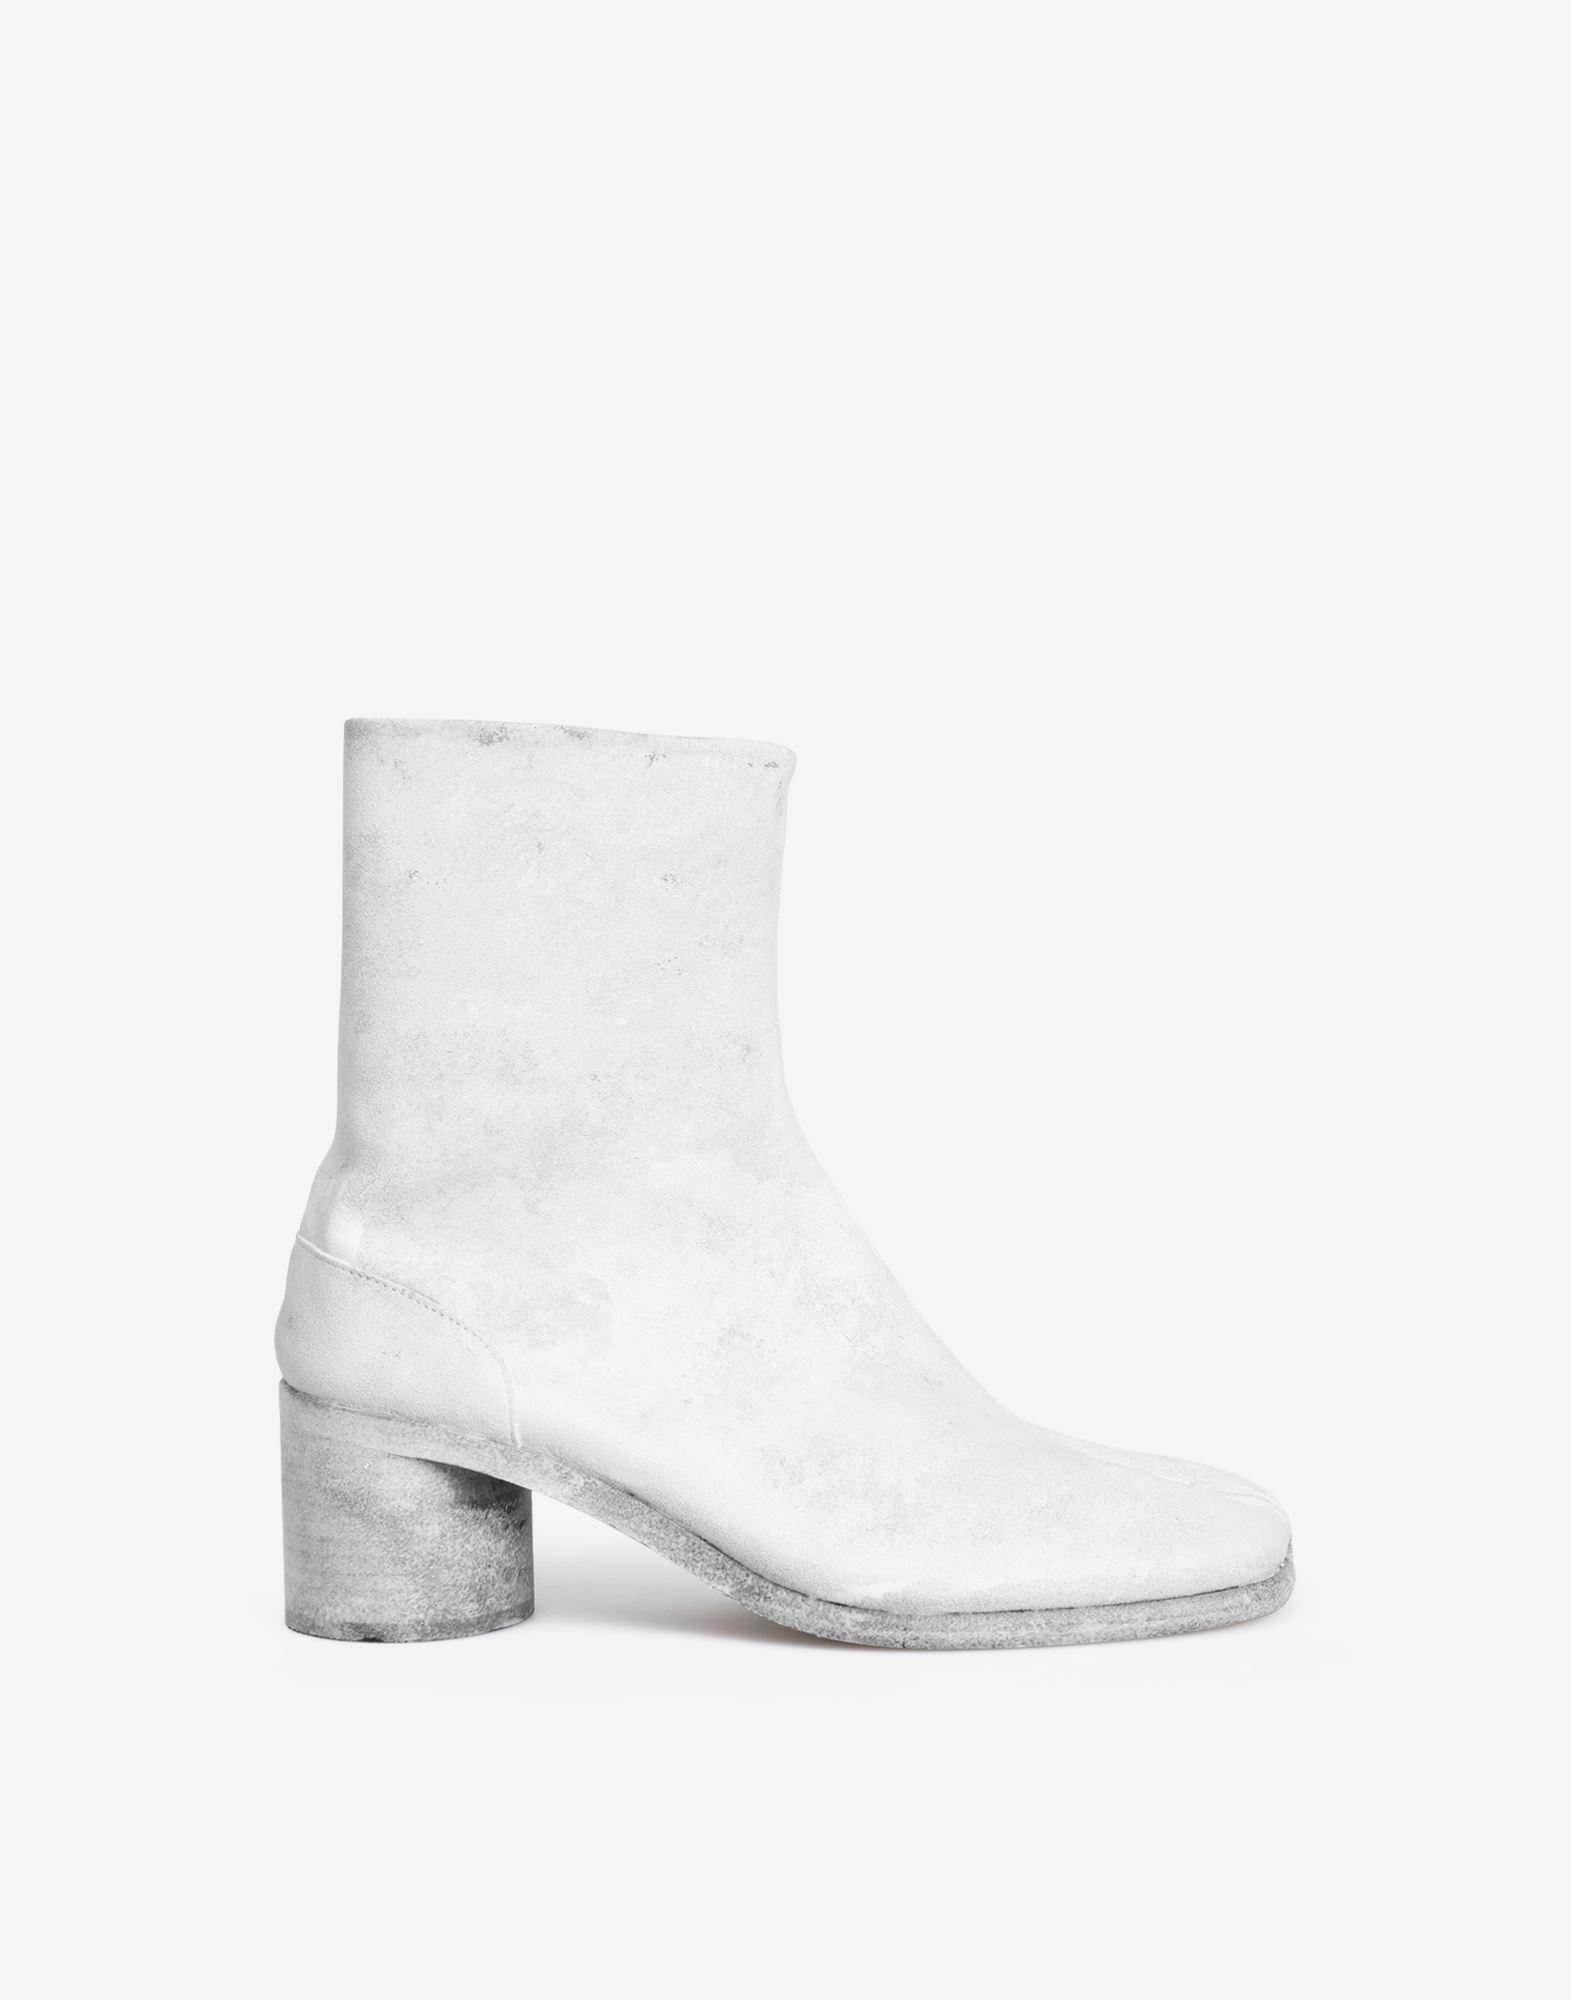 MAISON MARGIELA Painted Tabi ankle boots Tabi boots Man f